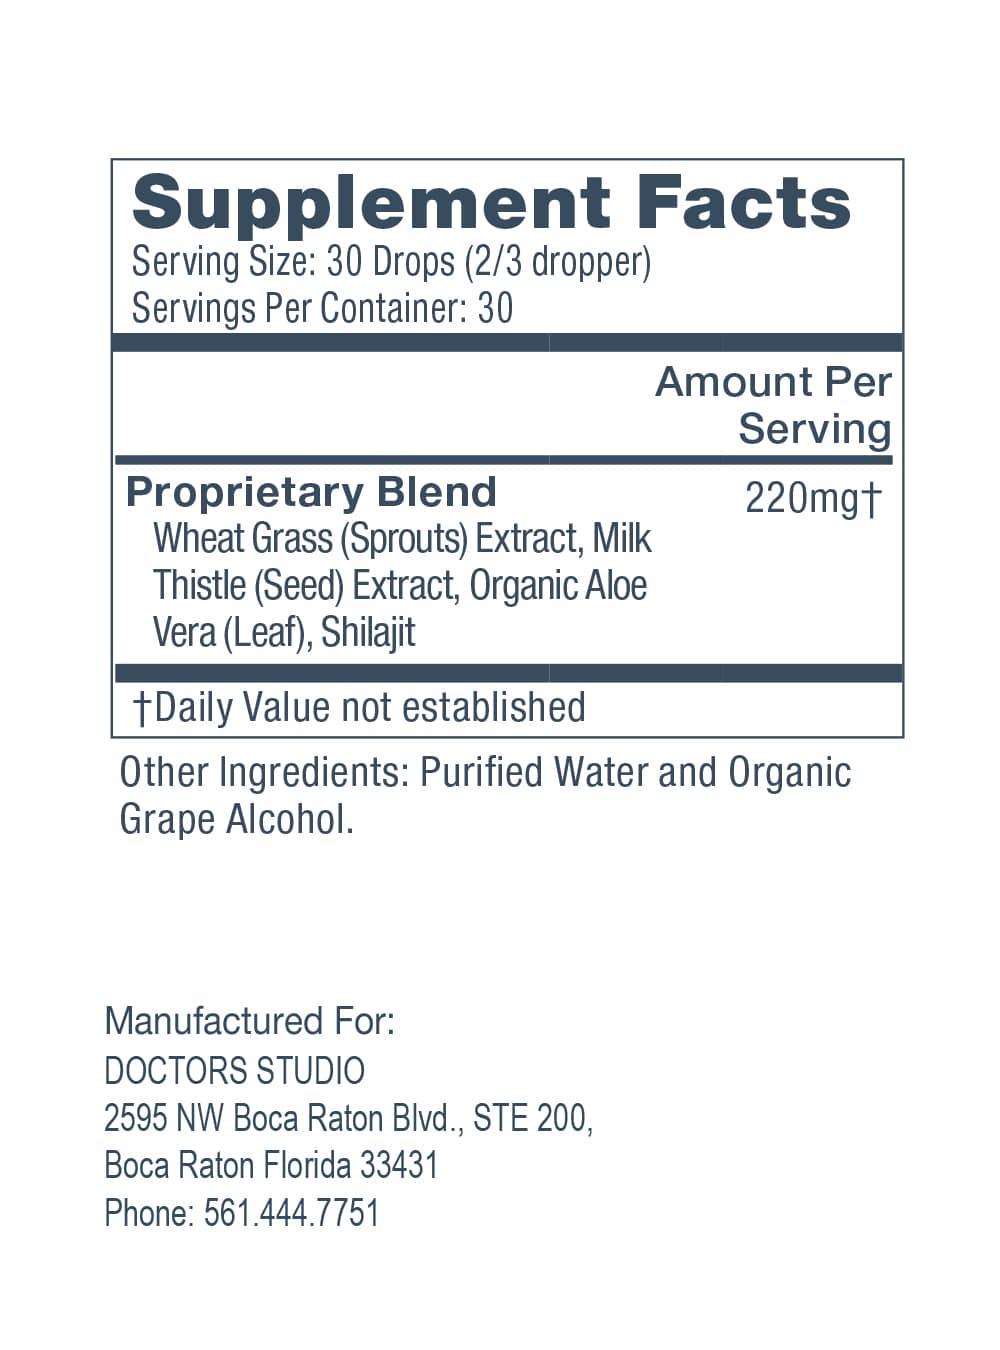 DeTOX, Supplements Facts